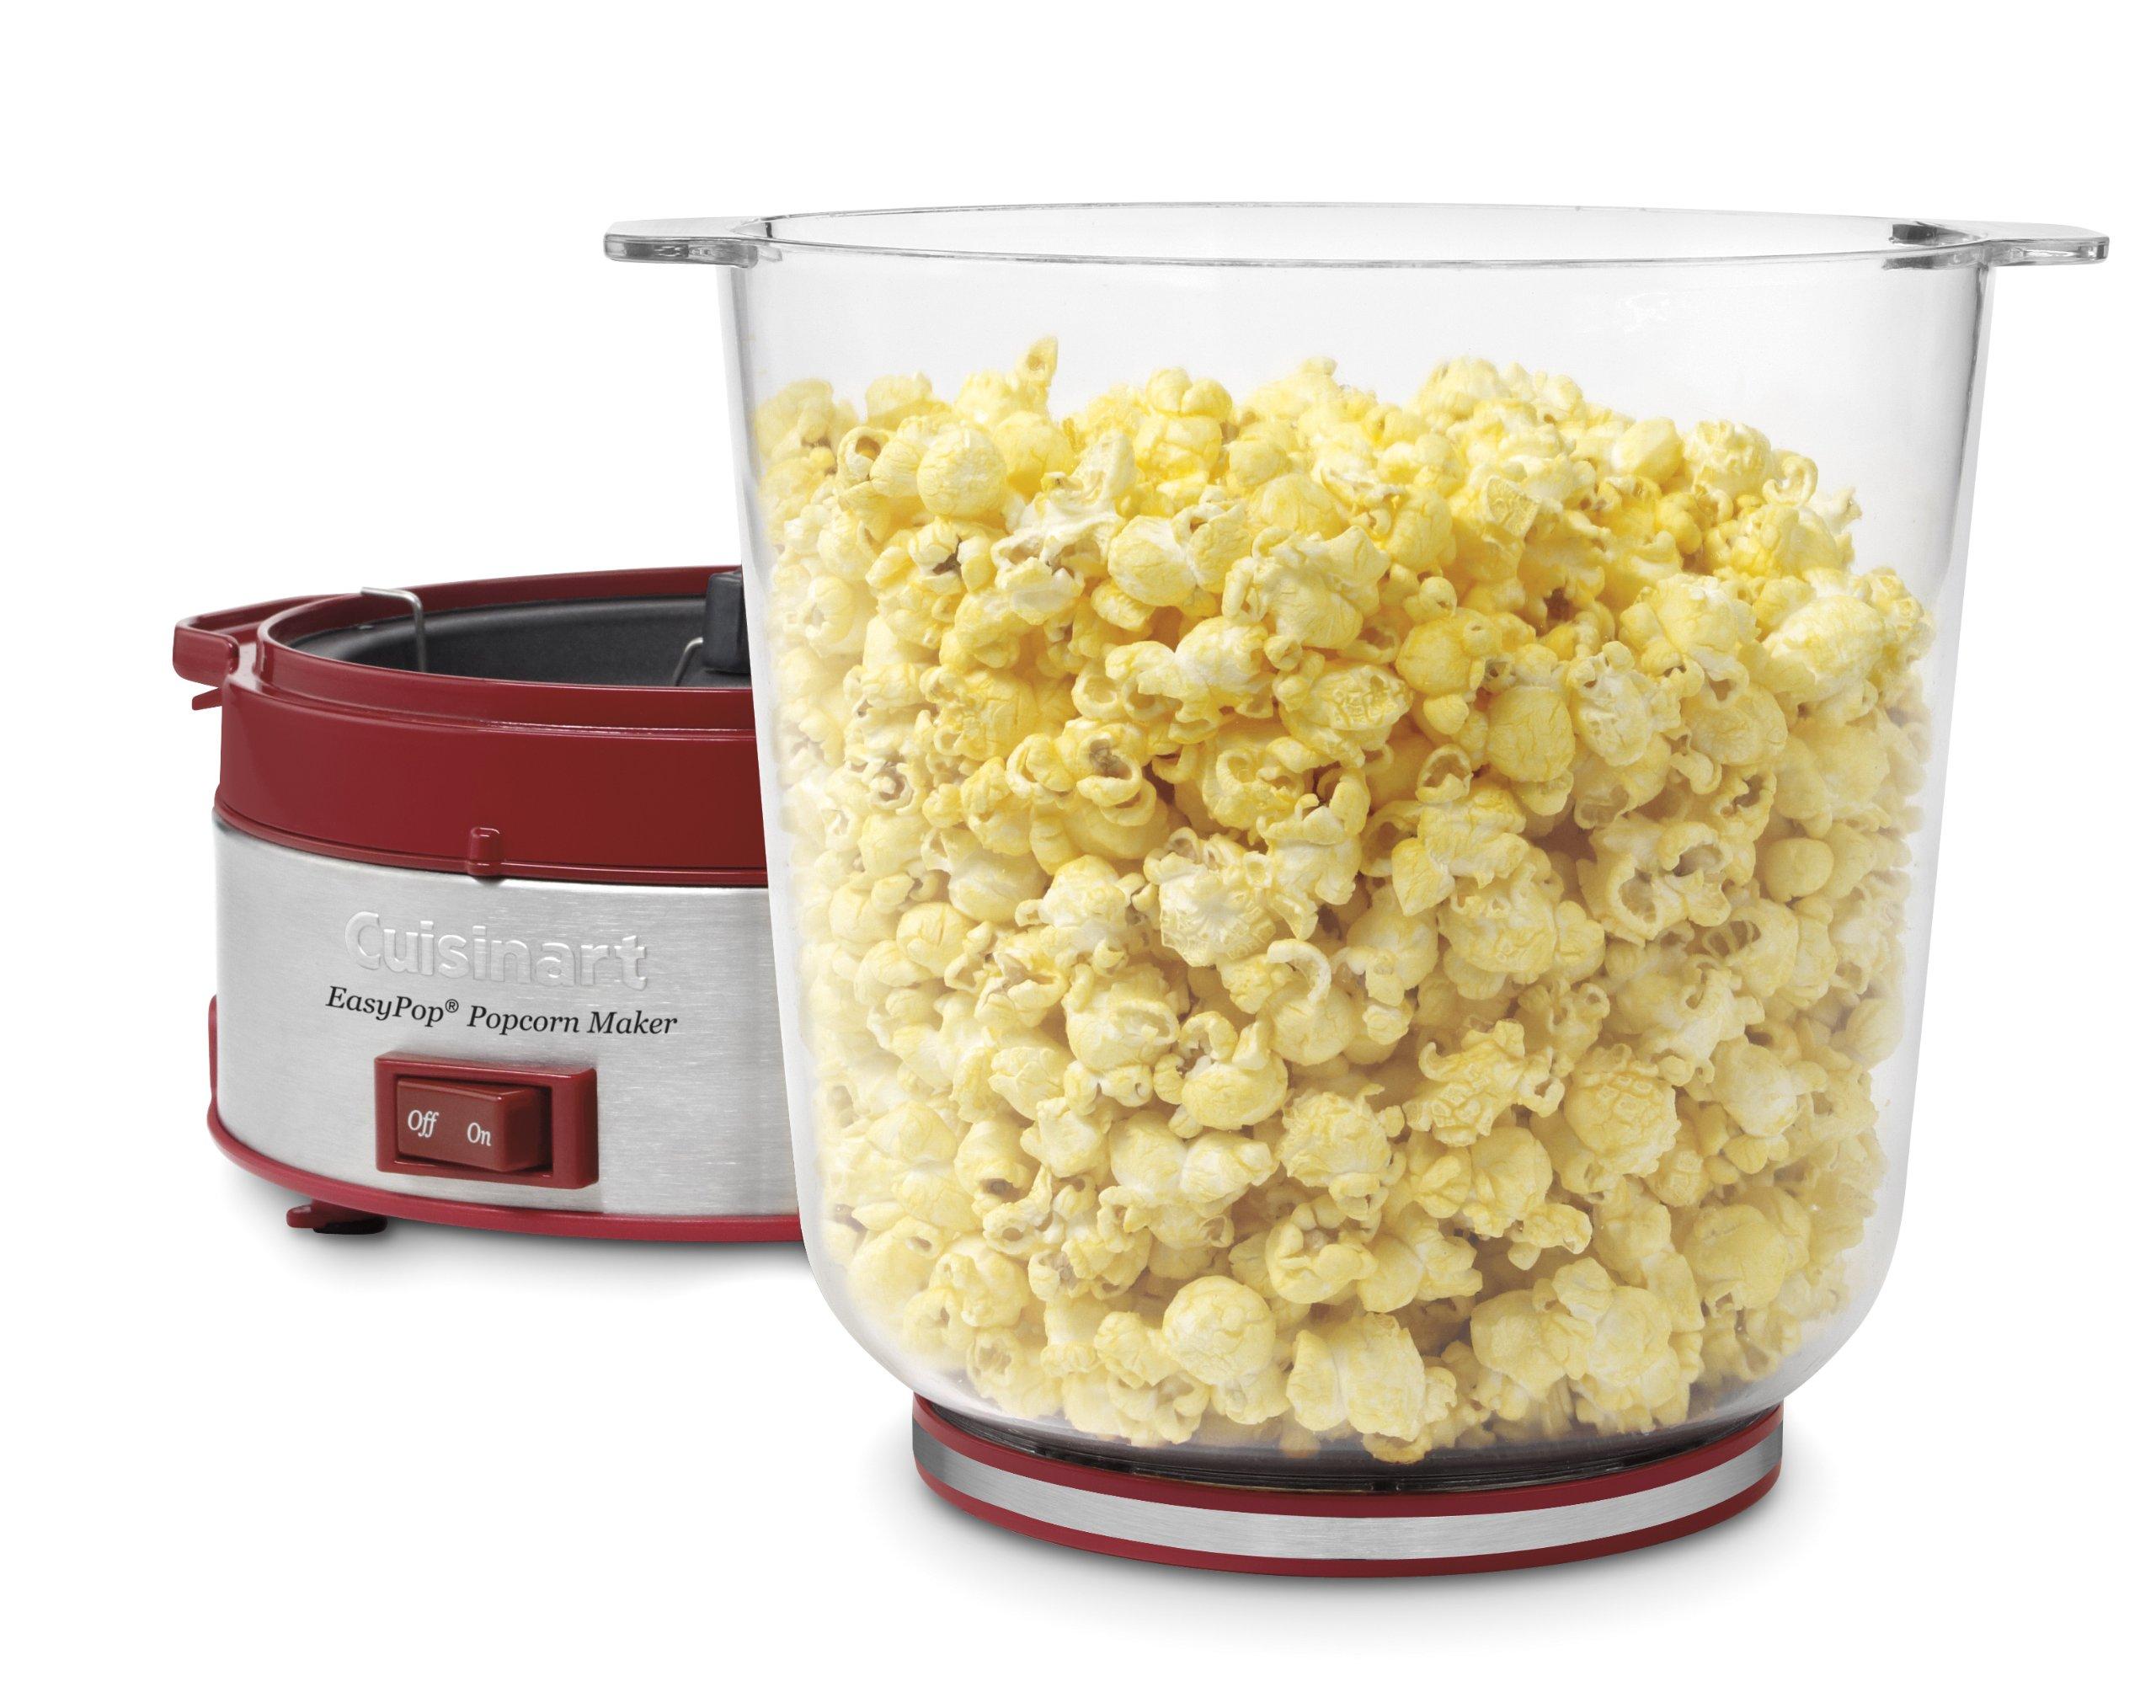 Cuisinart CPM-700 EasyPop Popcorn Maker, Red by Cuisinart (Image #4)